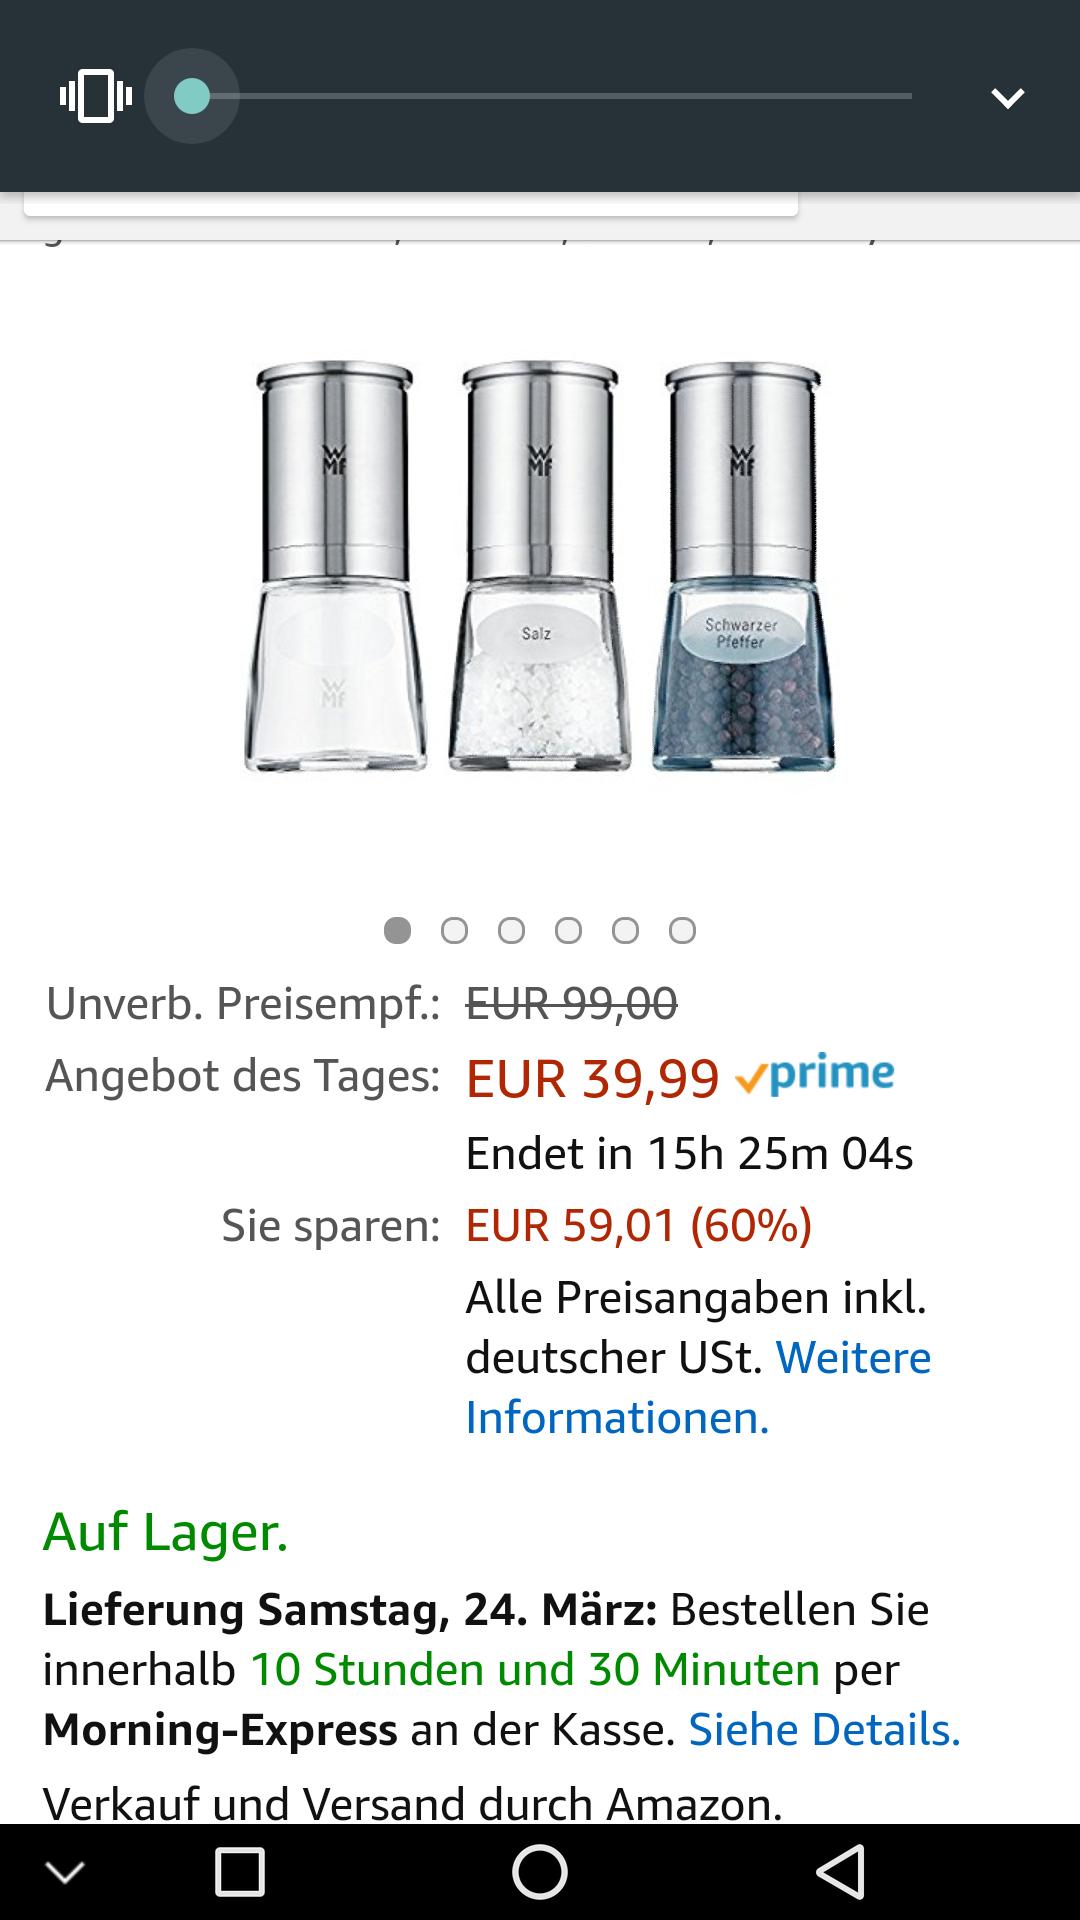 [Amazon.de] WMF De Luxe Salz und Pfeffermühle-Set 3-teilig,